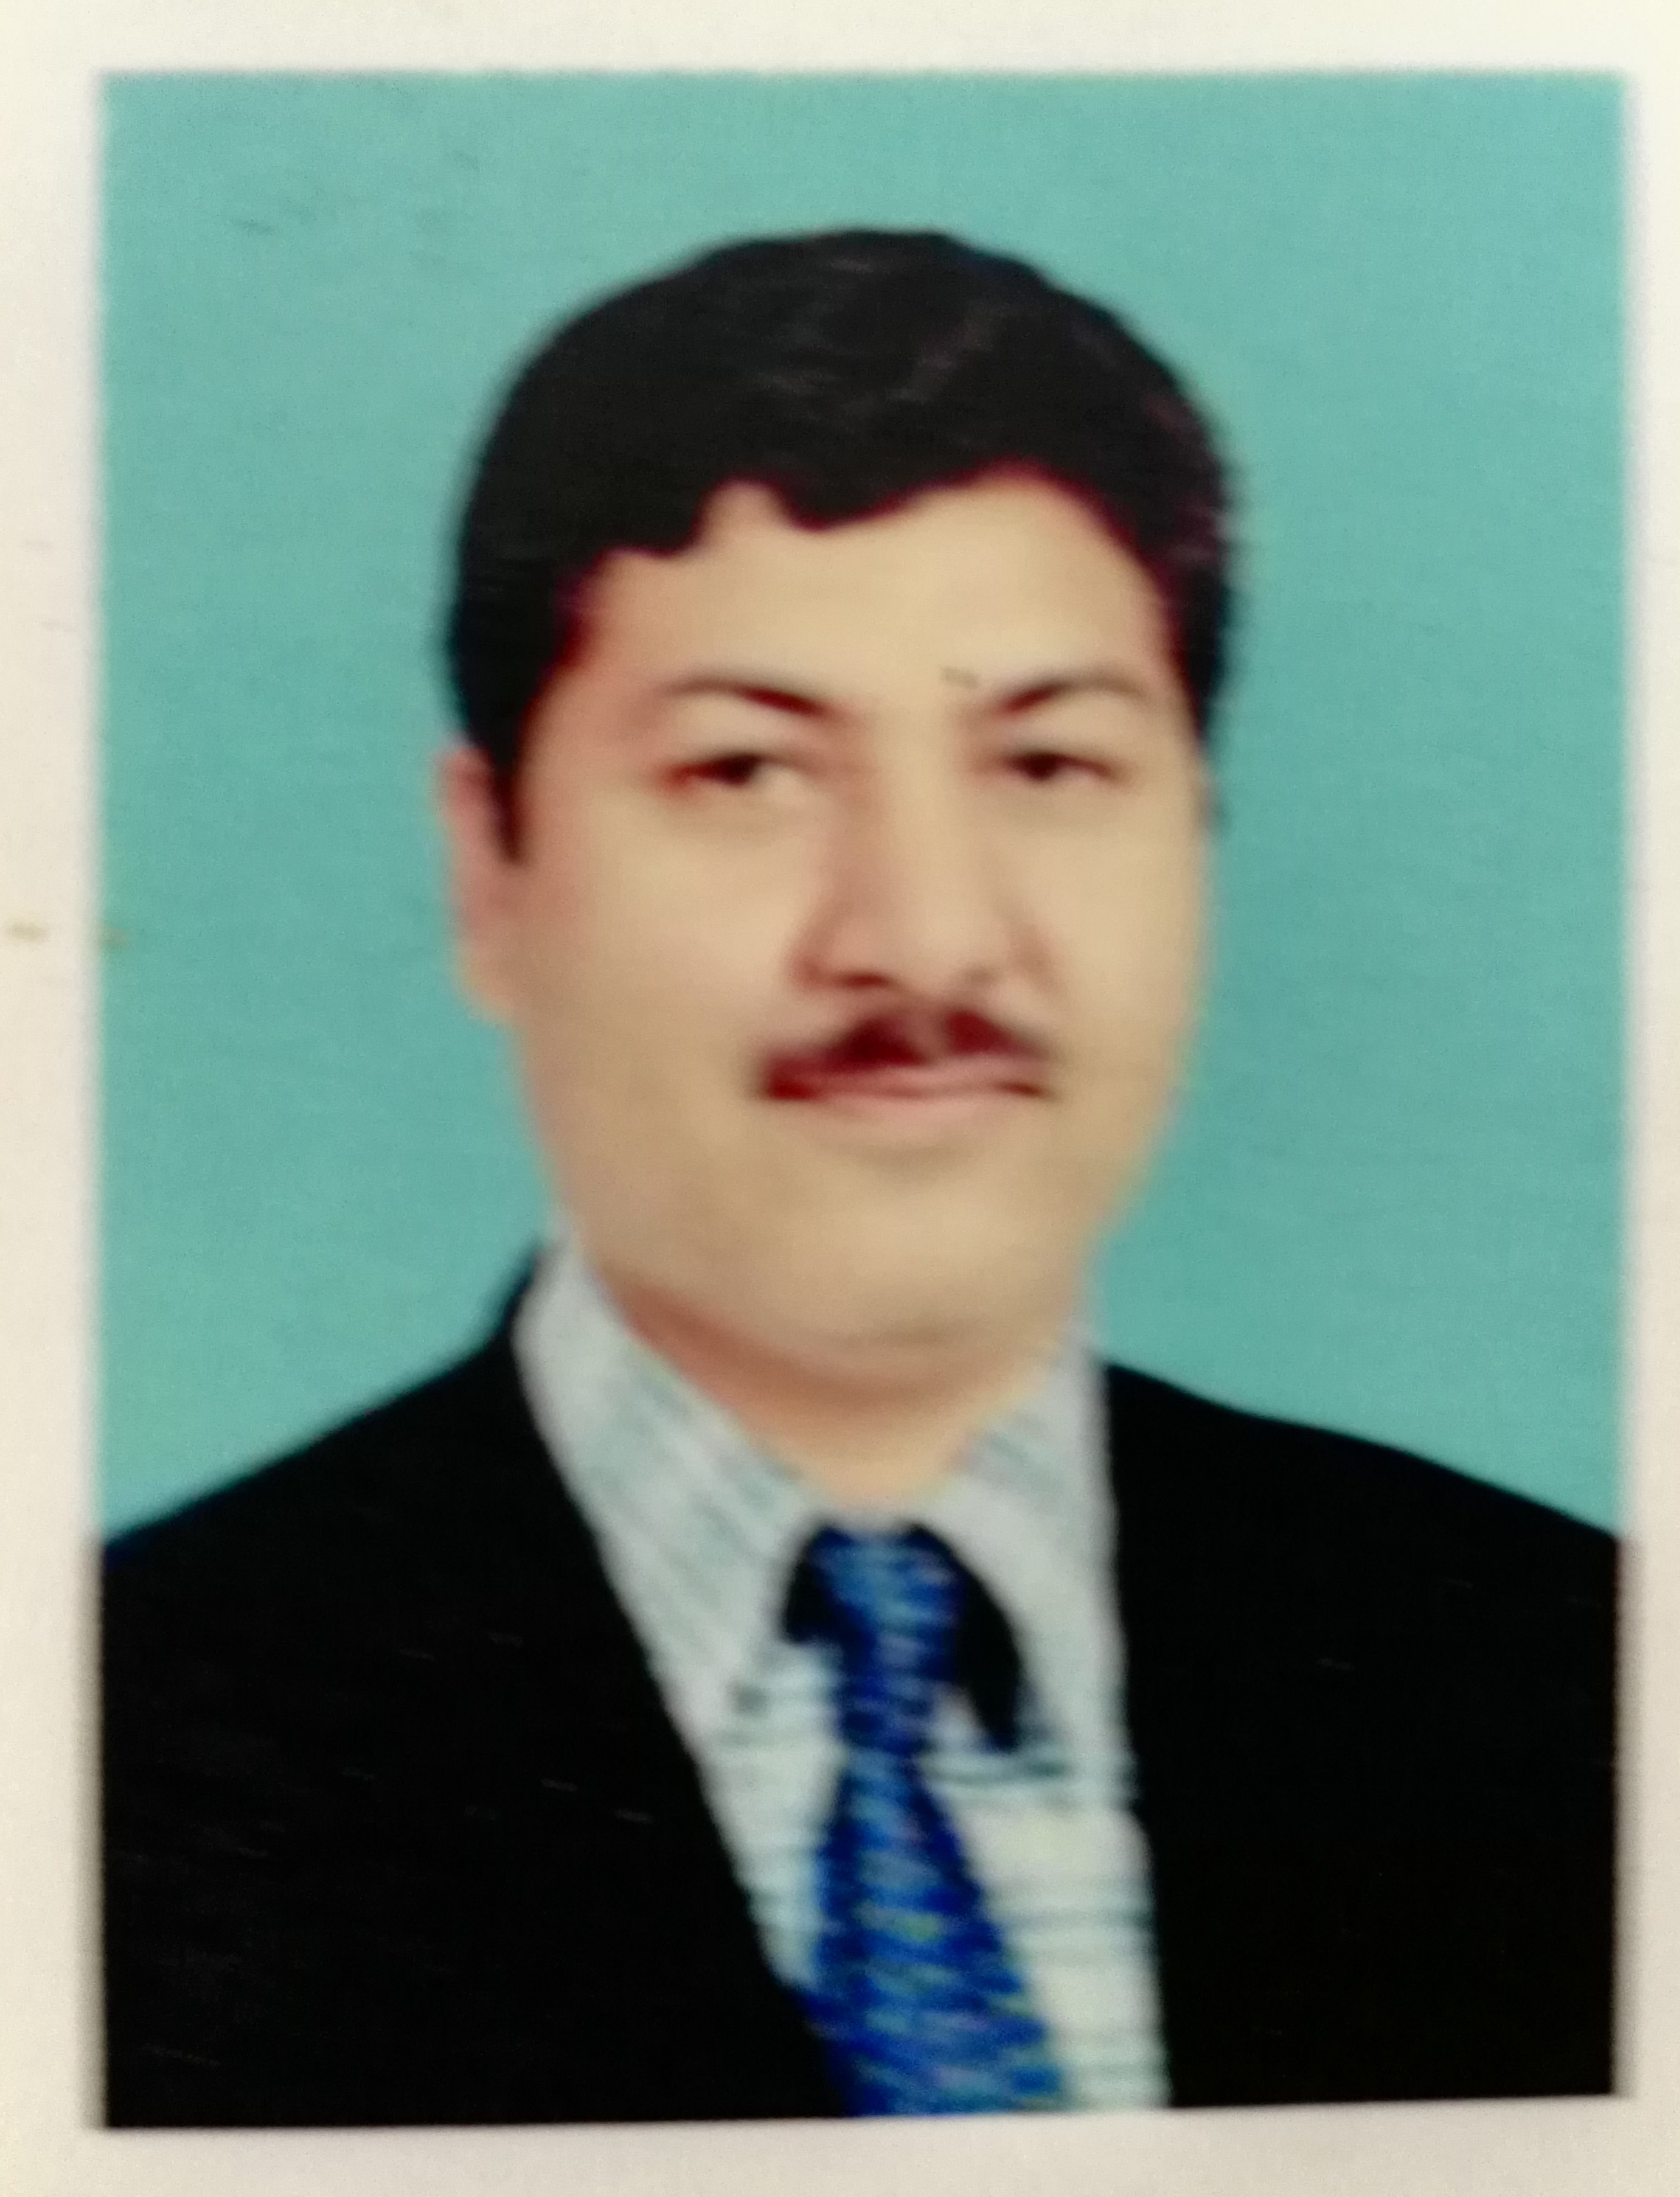 Mr. M. Waseem Aslam